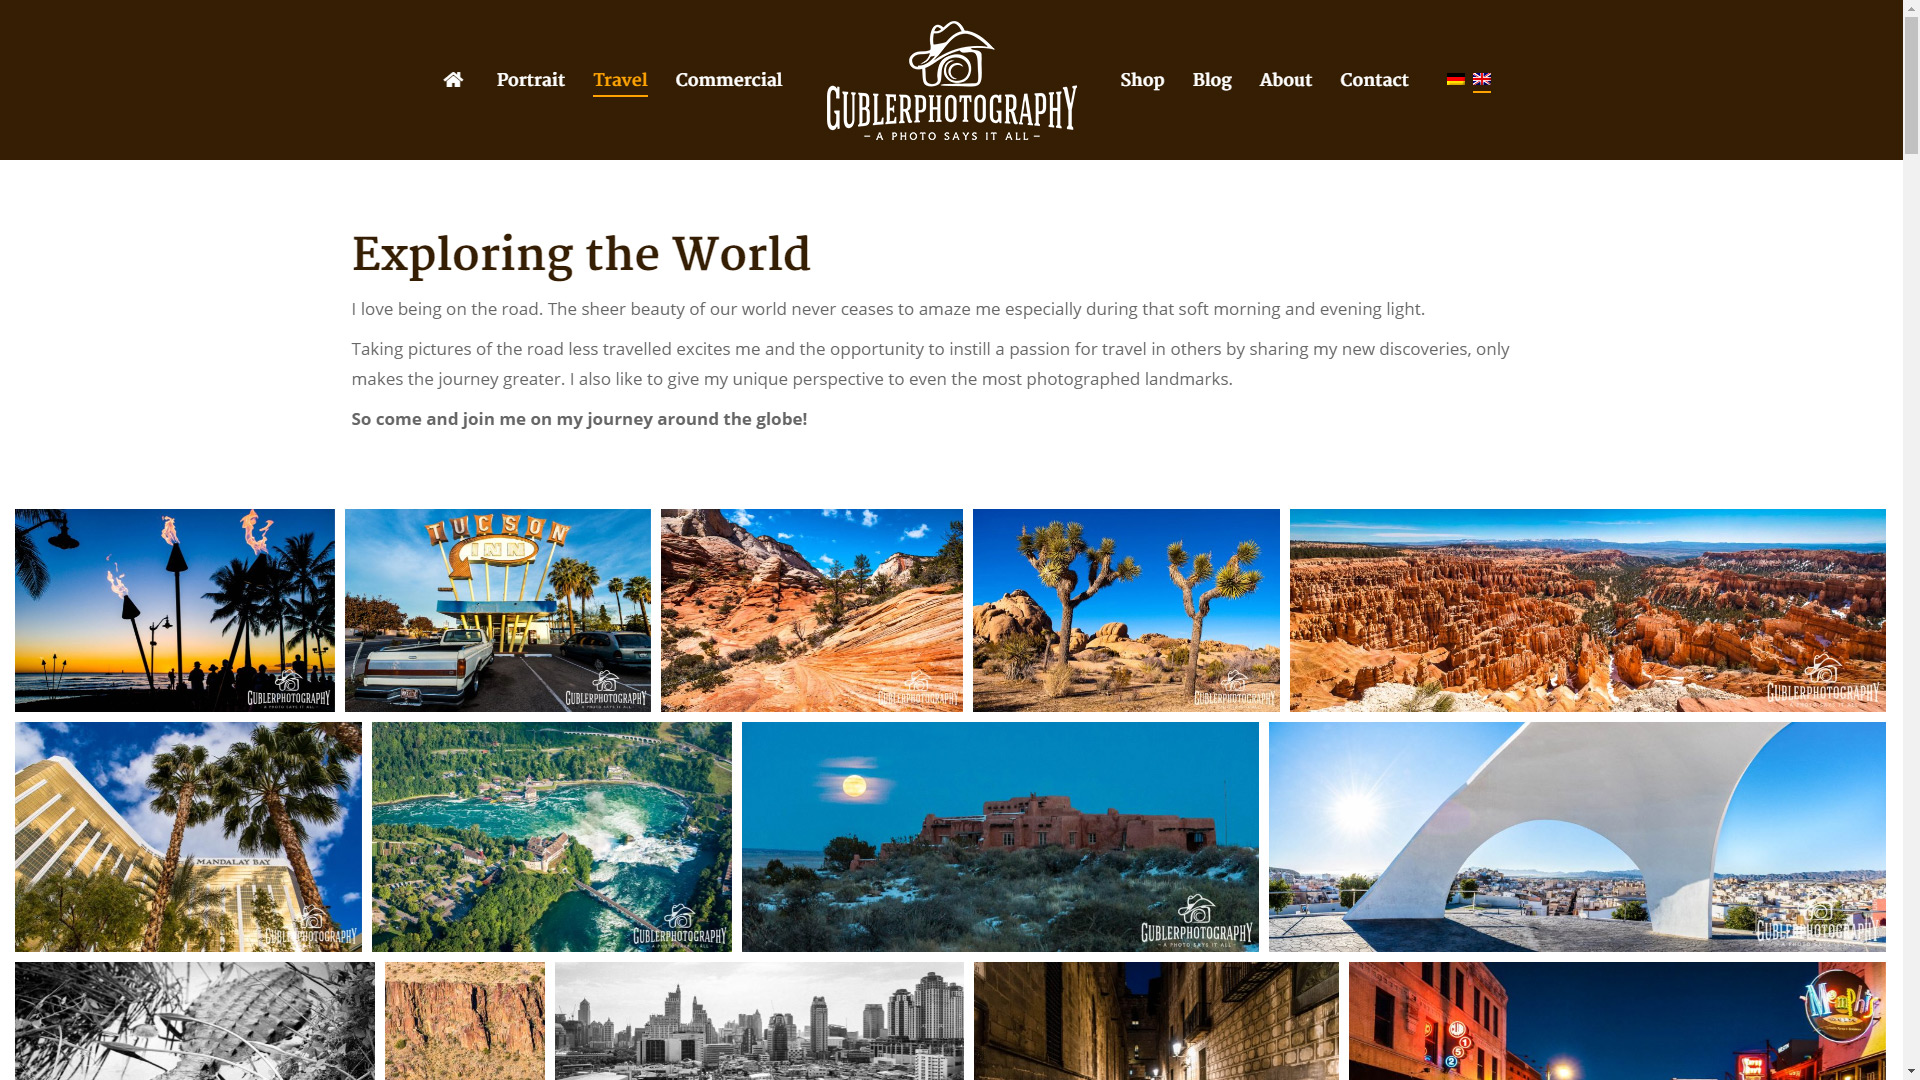 Gallery or portfolio page descriptions   ForegroundWeb